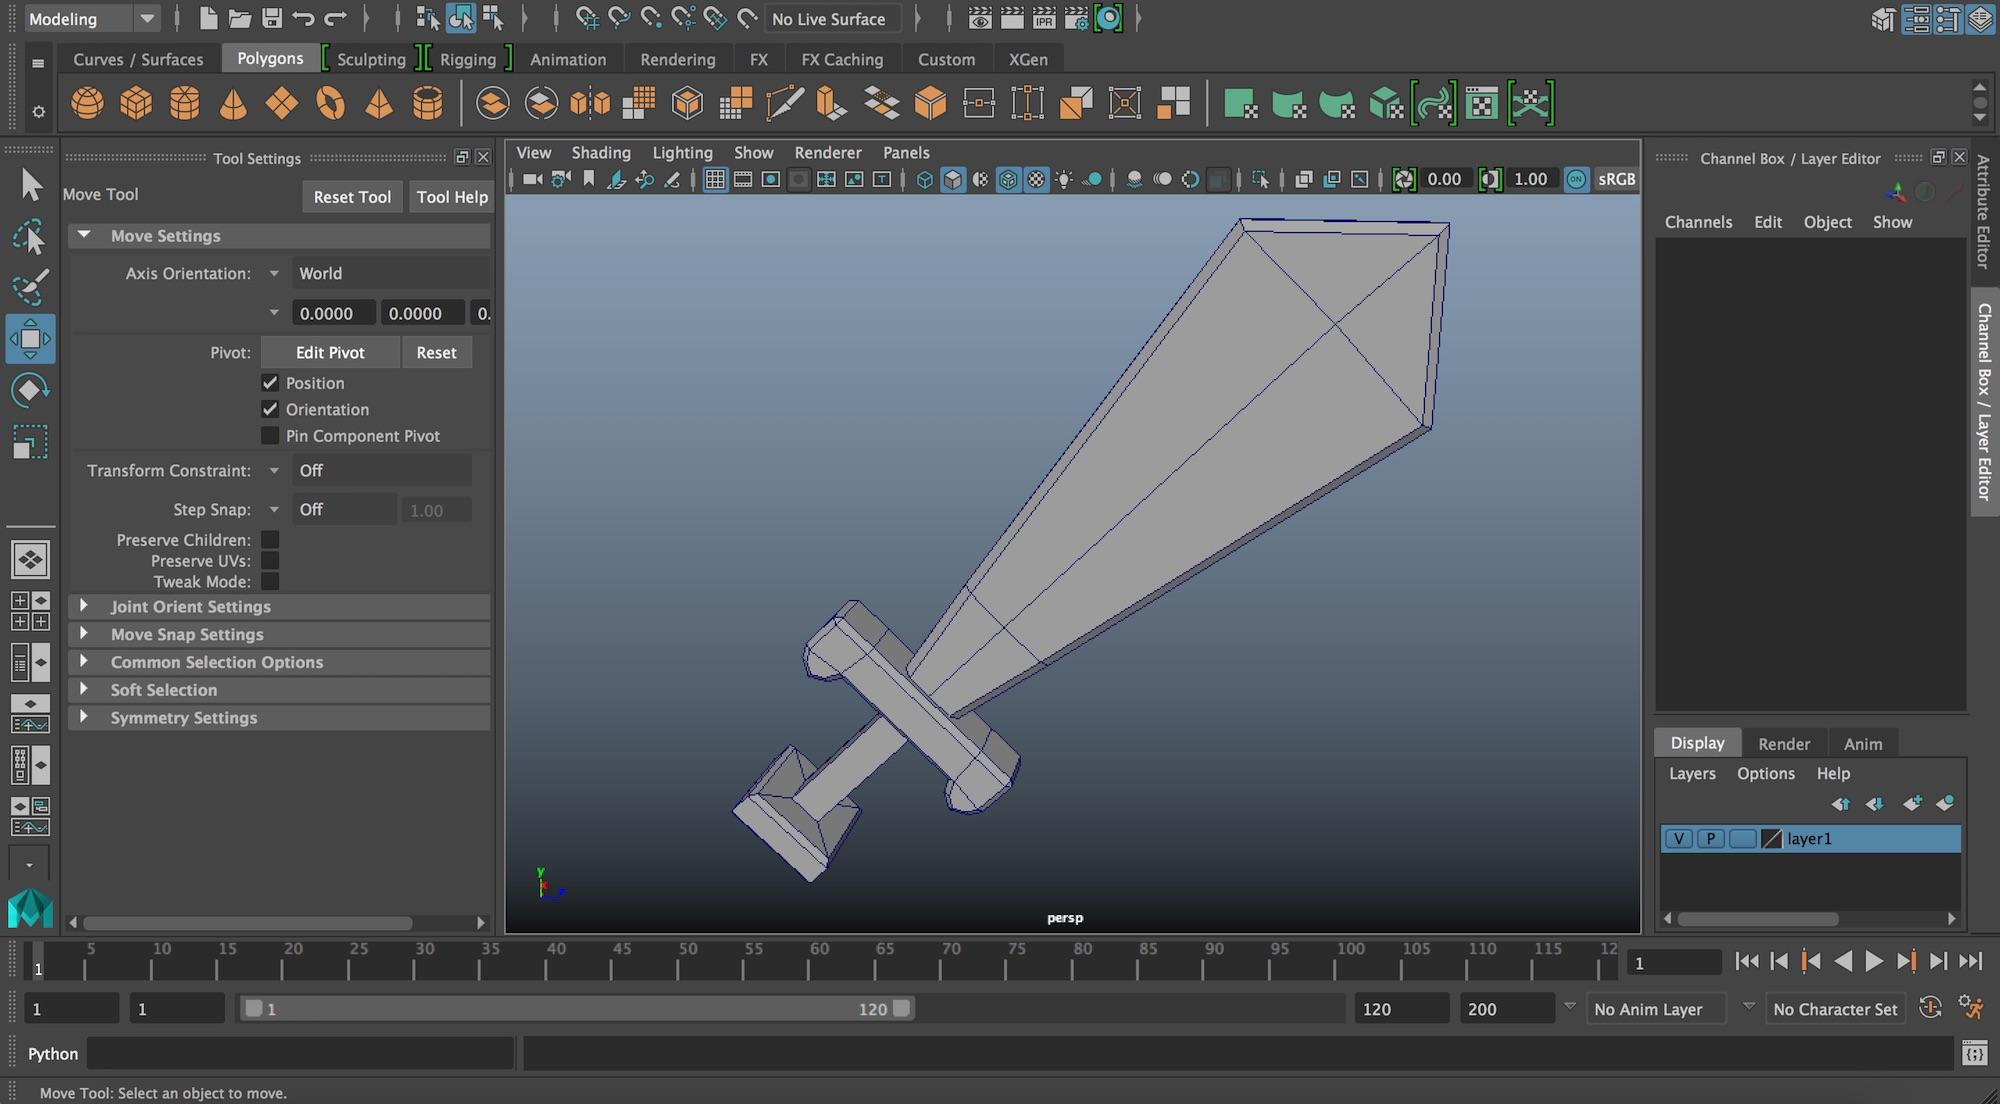 Autodesk Maya 小物(剣)のモデリング